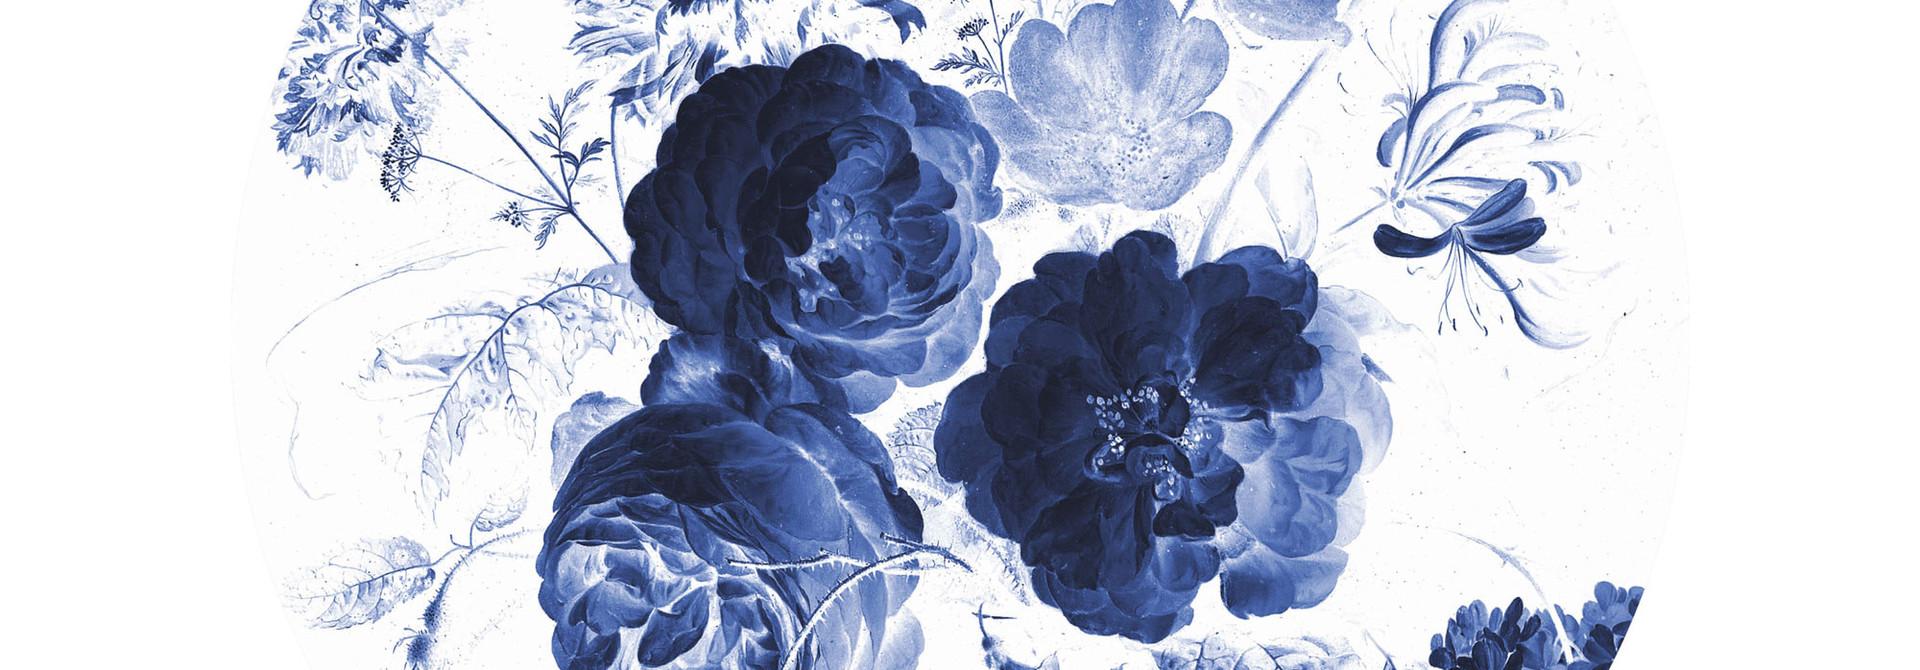 Behangcirkel Royal Blue Flowers - Small